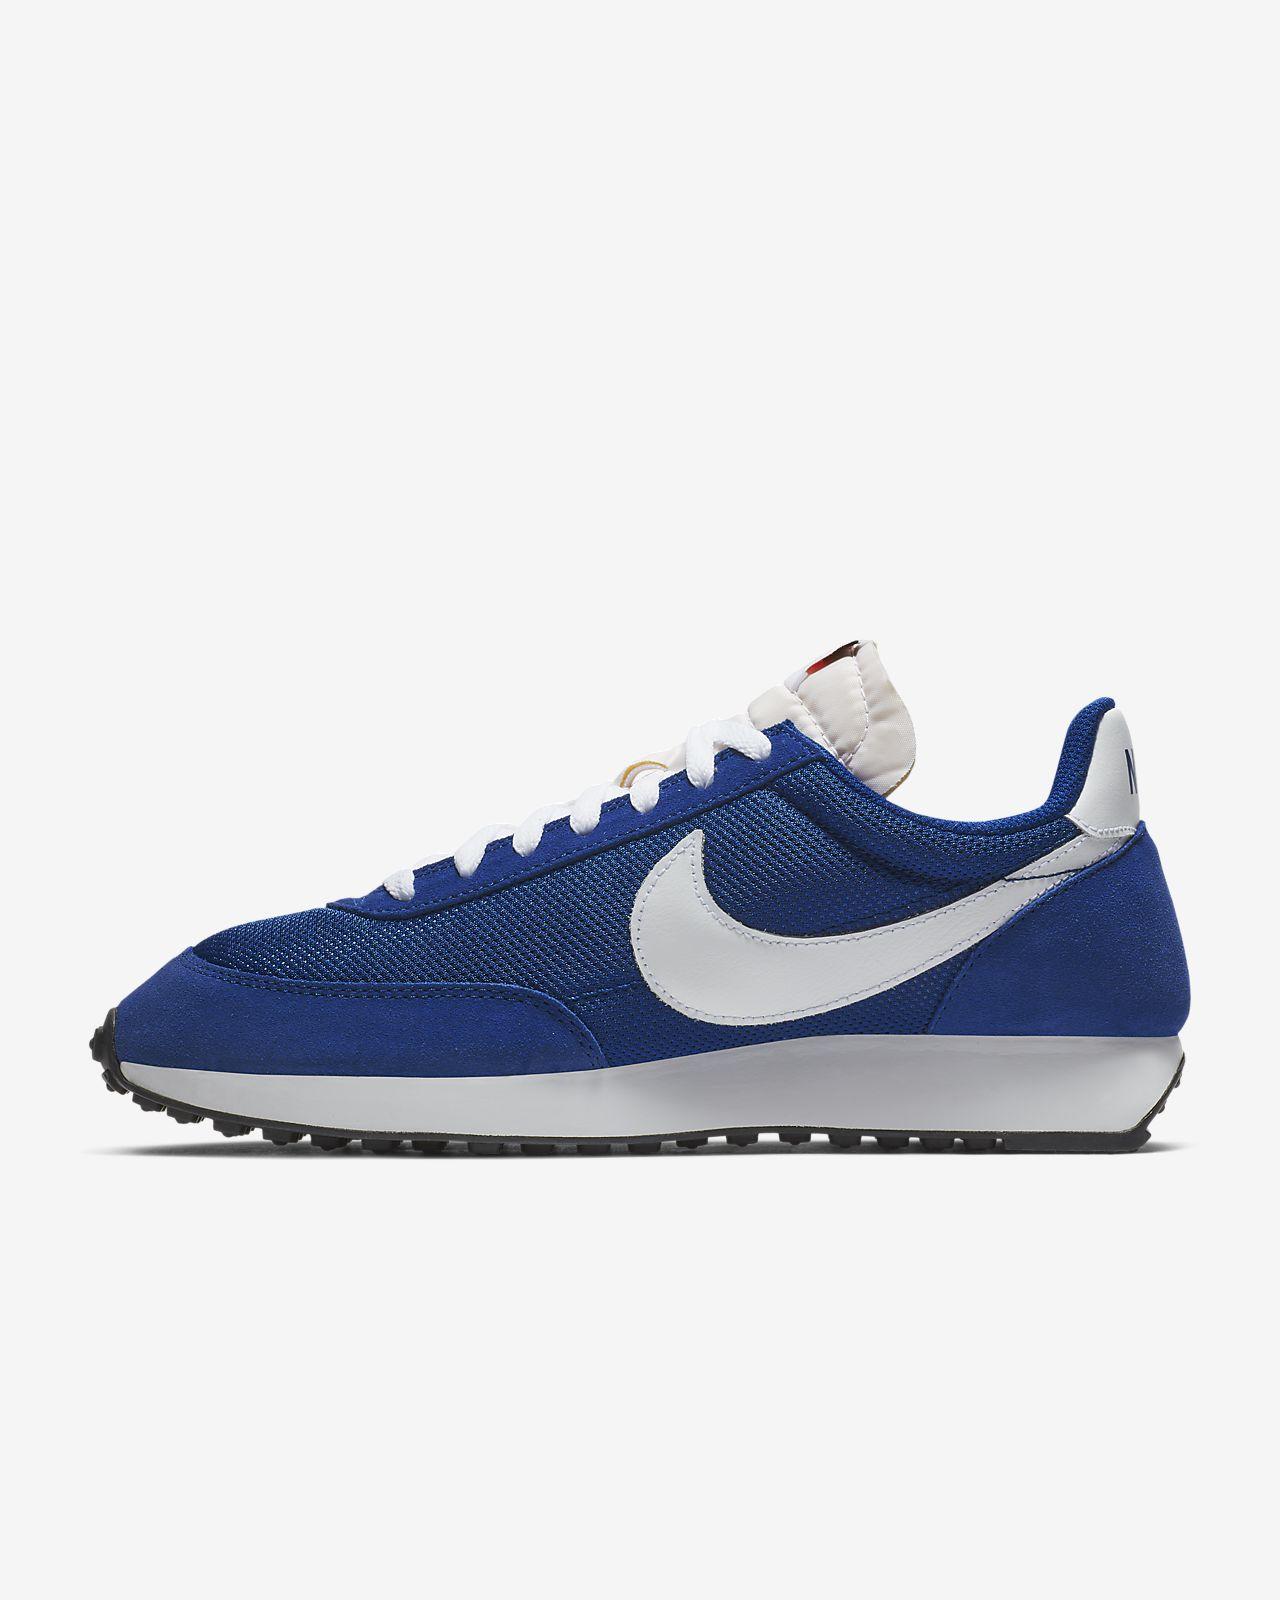 a71592c476 Nike Air Tailwind 79 Men s Shoe. Nike.com MY